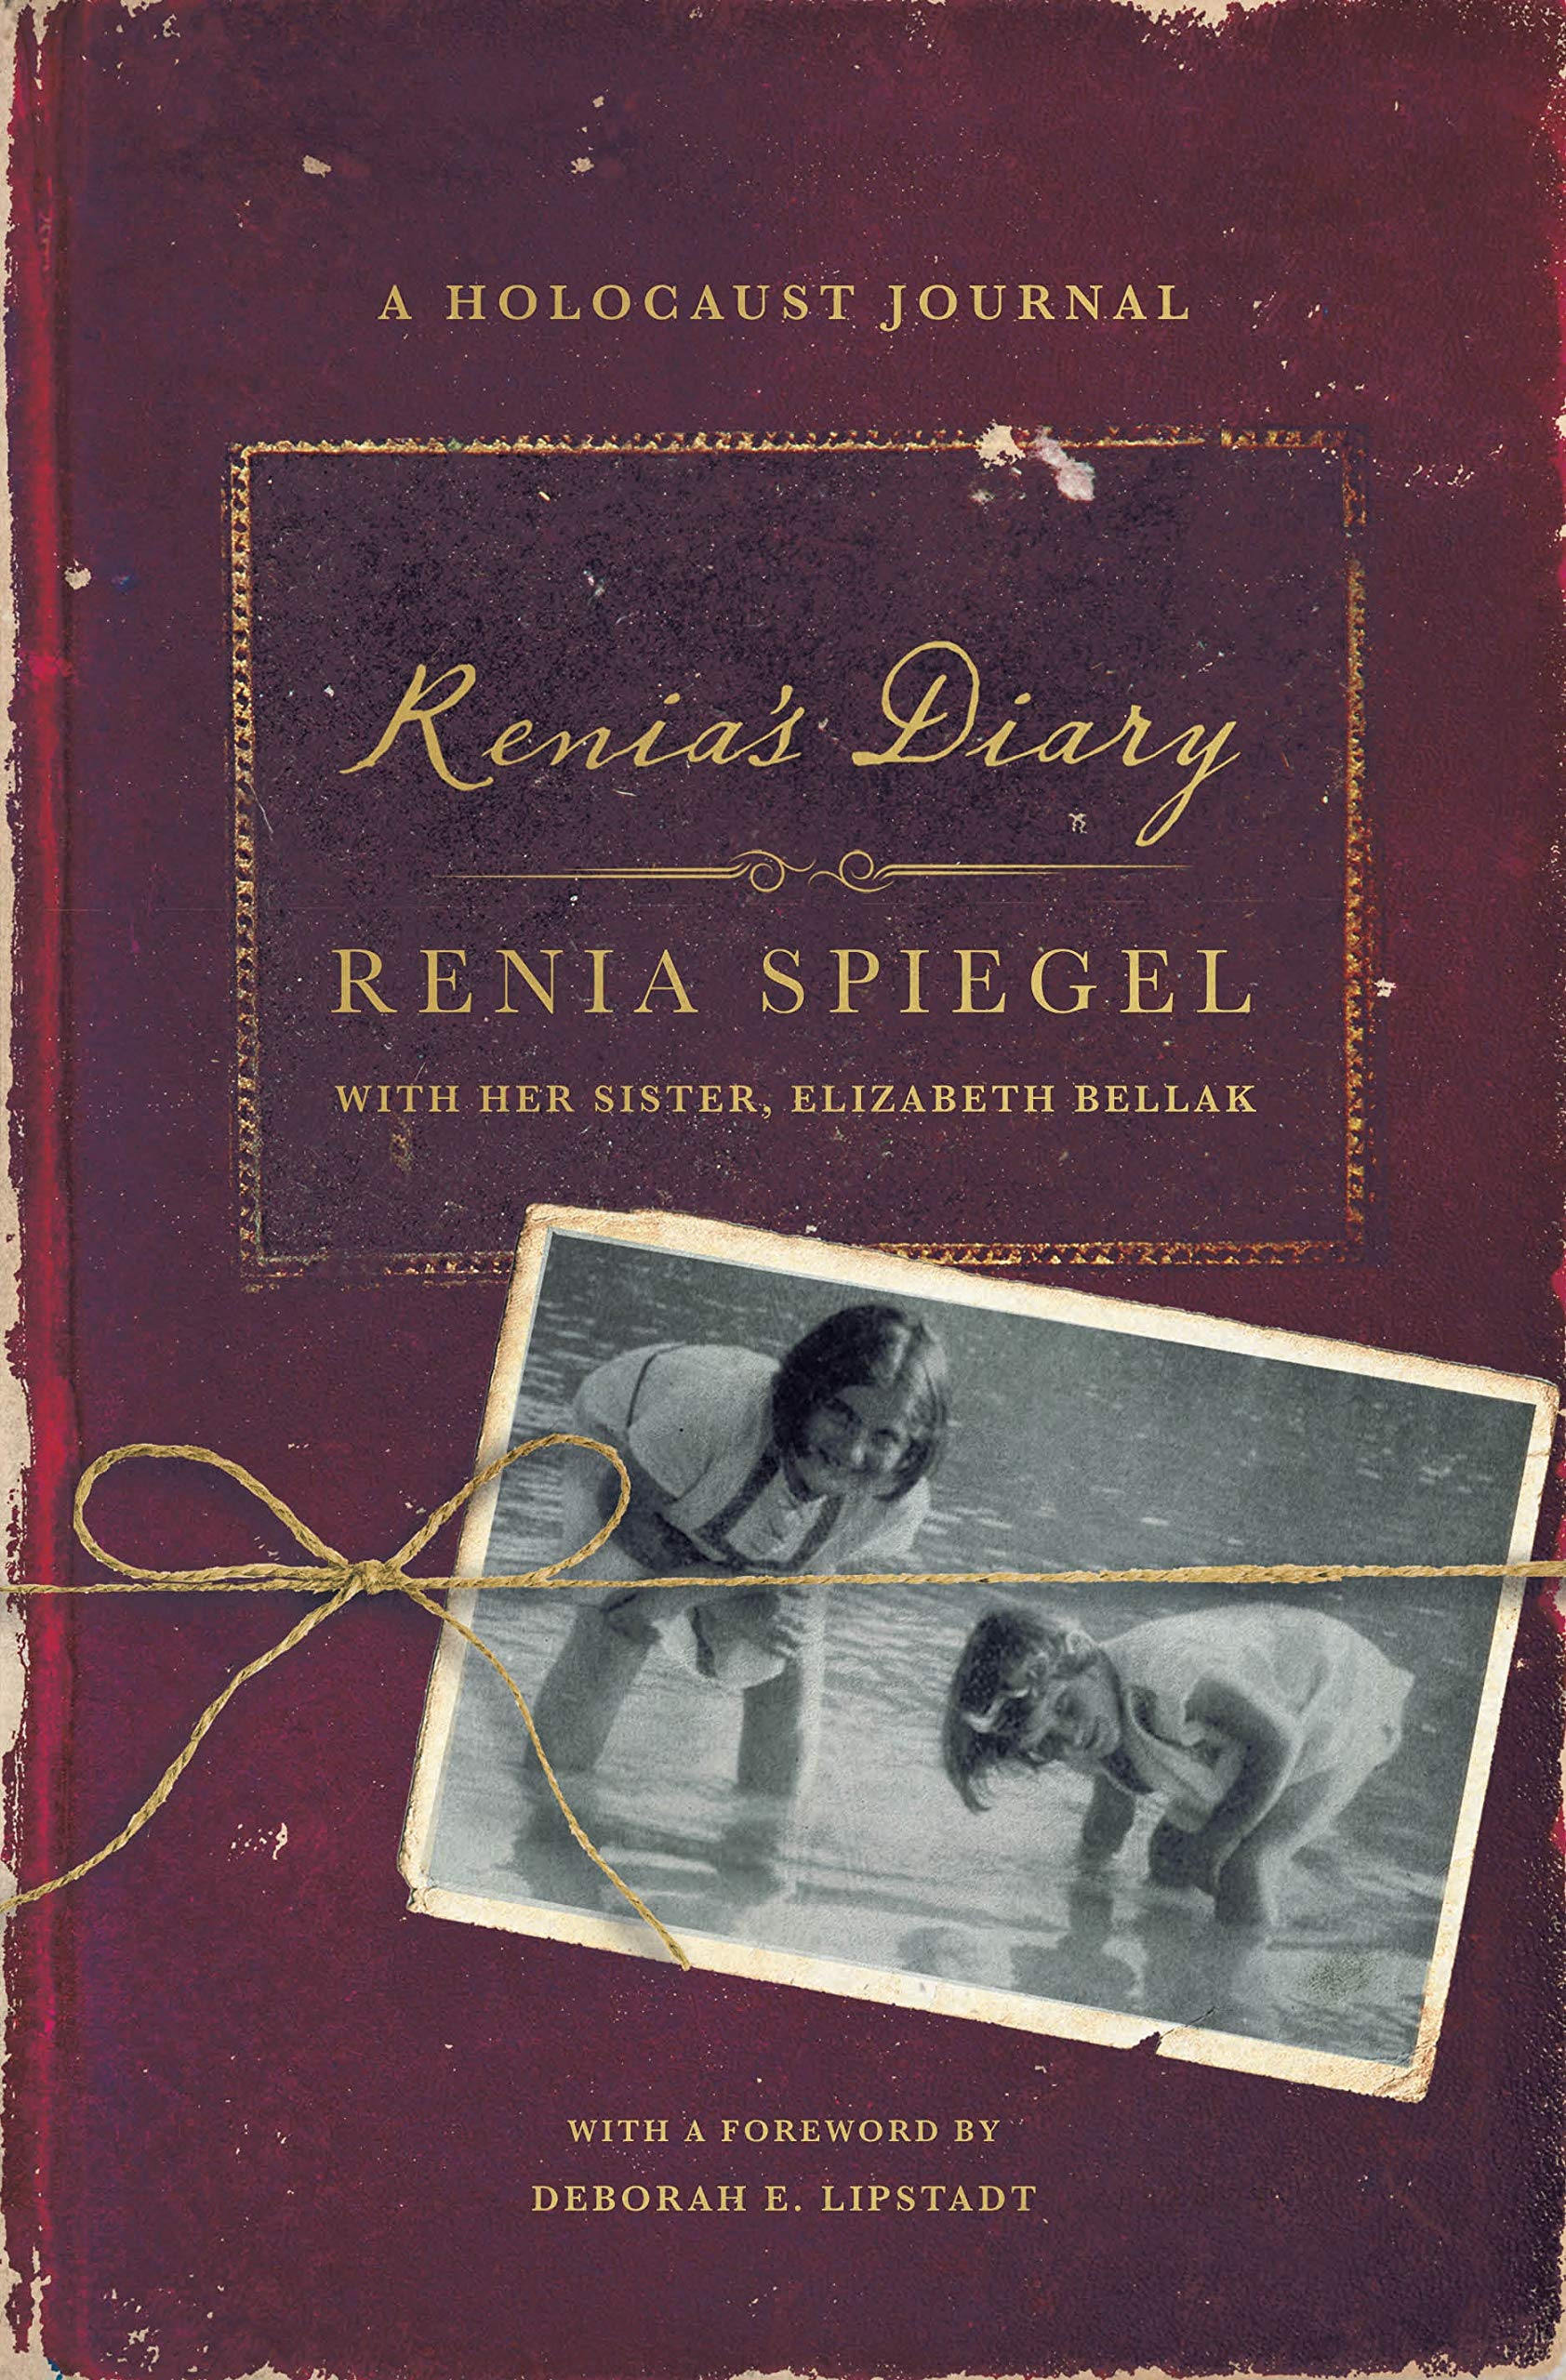 Renia S Diary A Holocaust Journal Spiegel Renia Bellak Elizabeth Durand Sarah Lipstadt Deborah 9781250244024 Books Amazon Ca